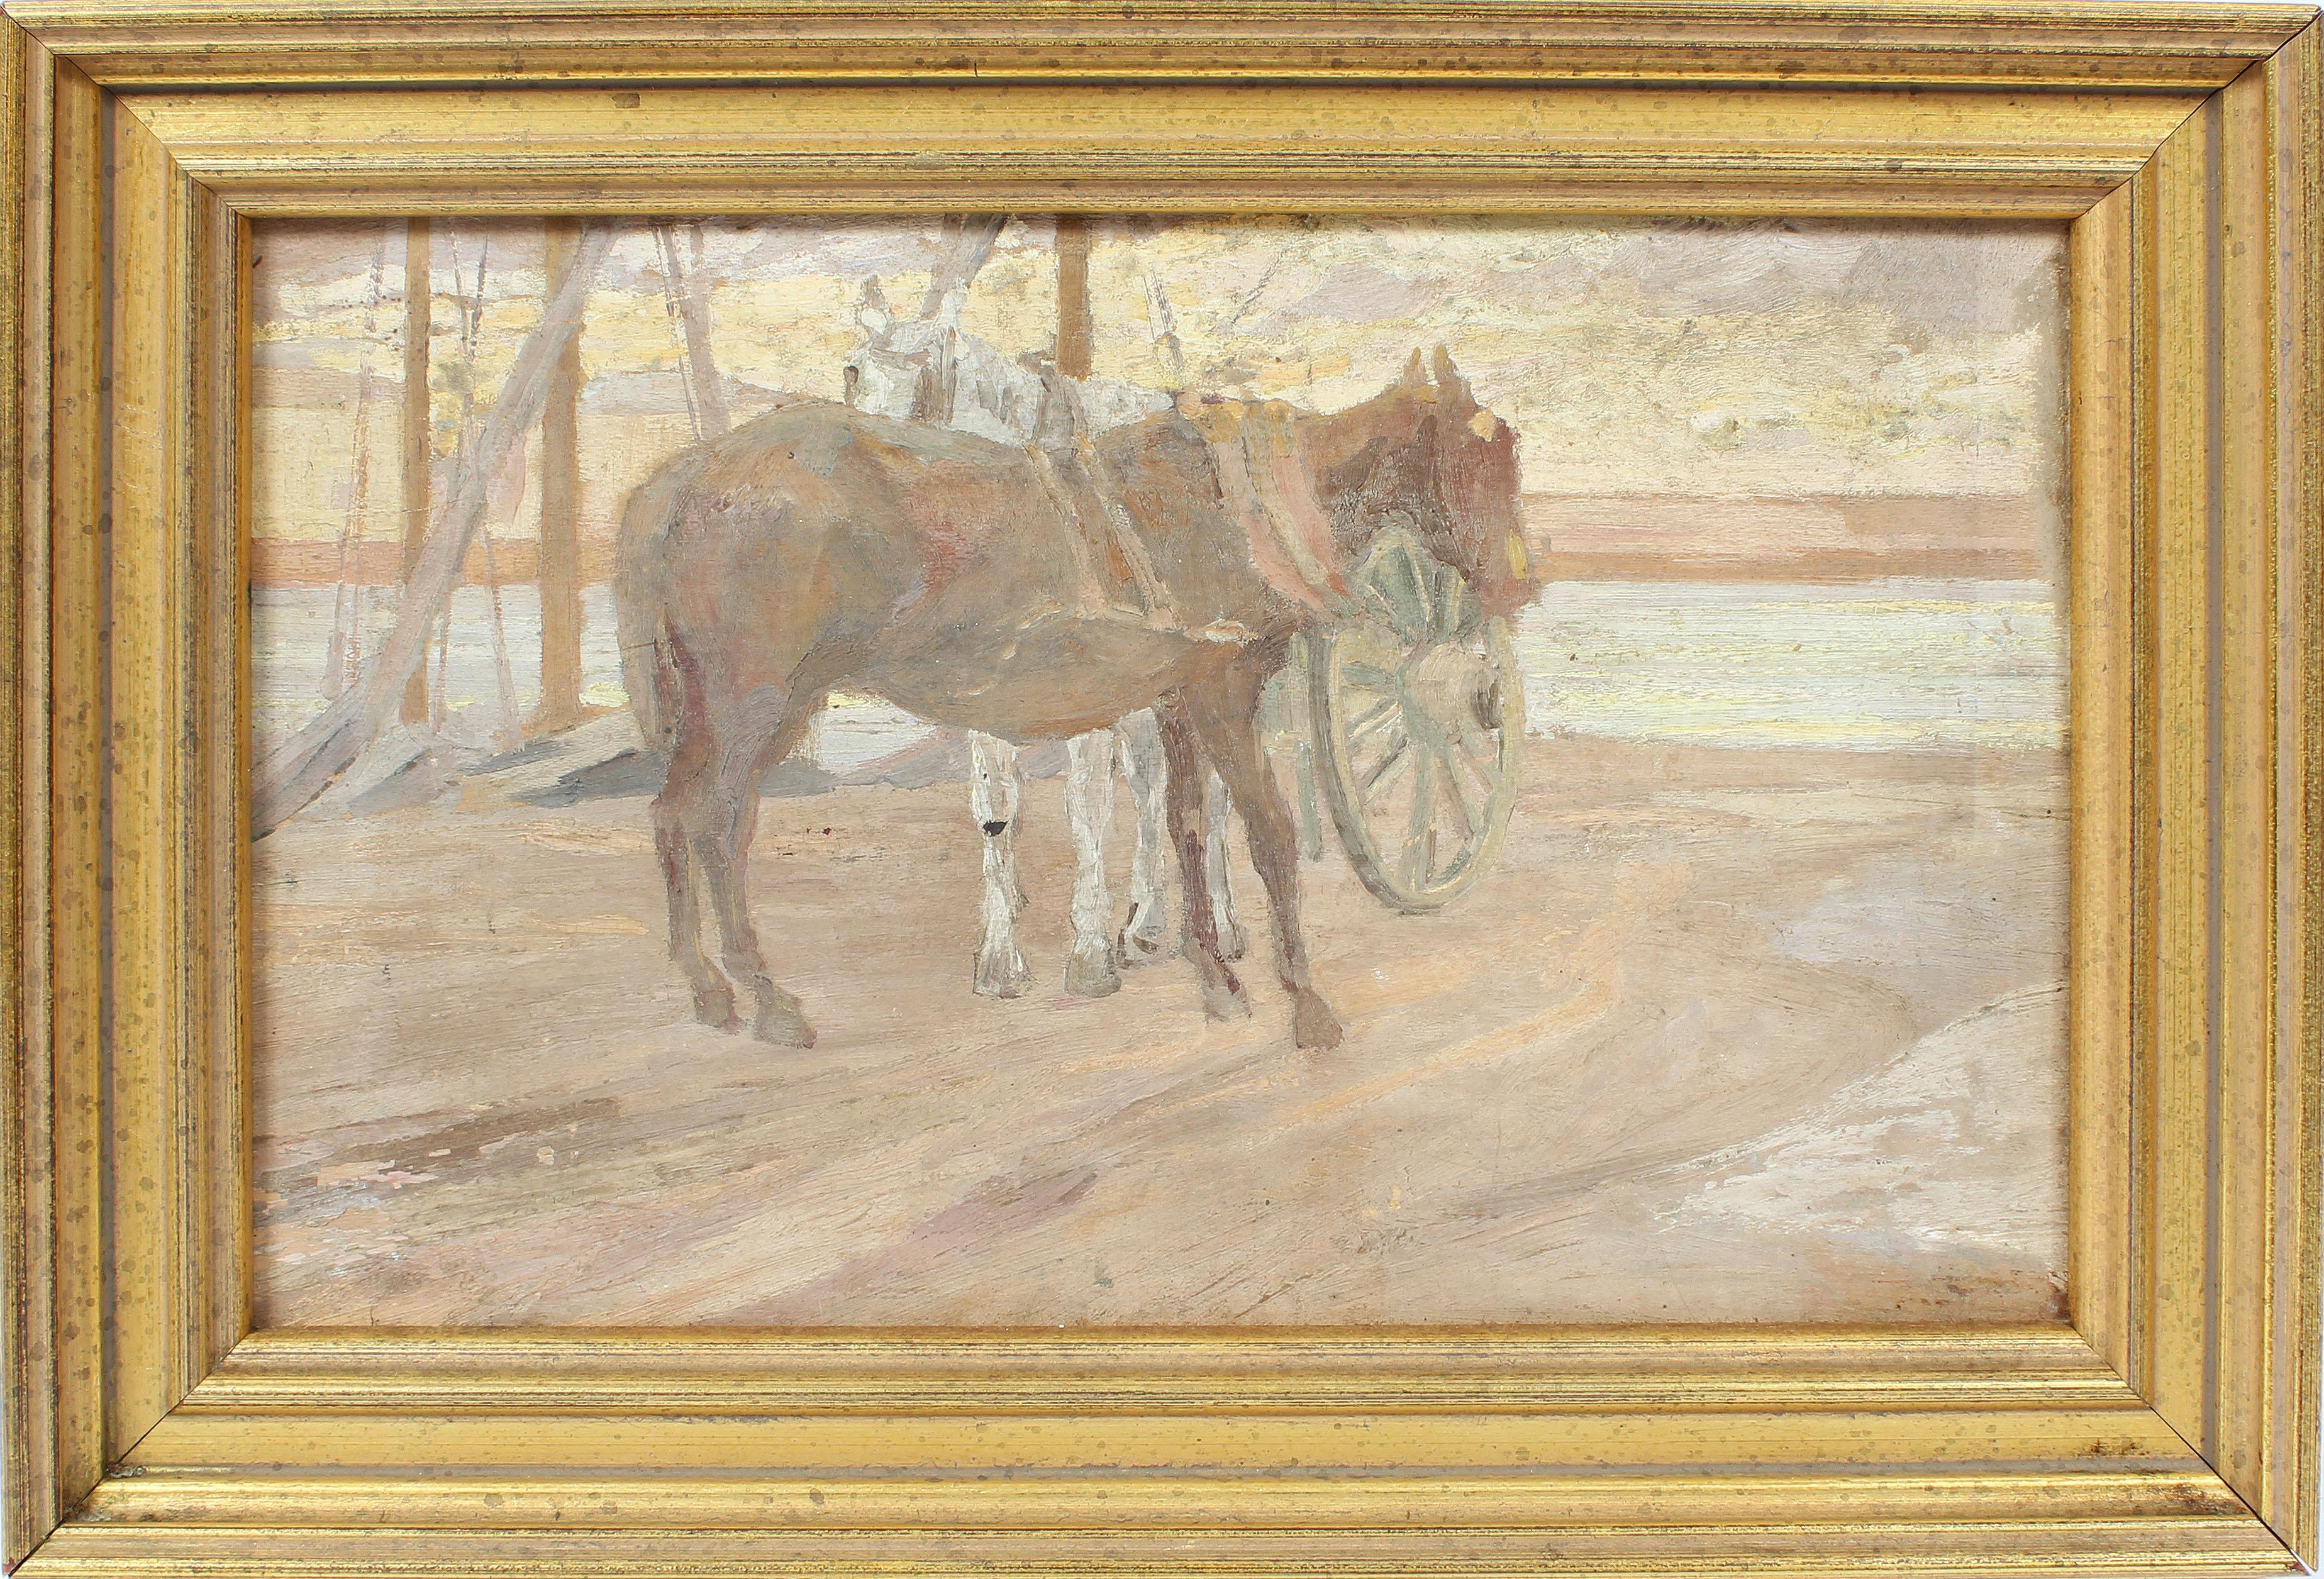 Antique American Impressionist Coastal Horse Portrait Sunset Luminous Painting